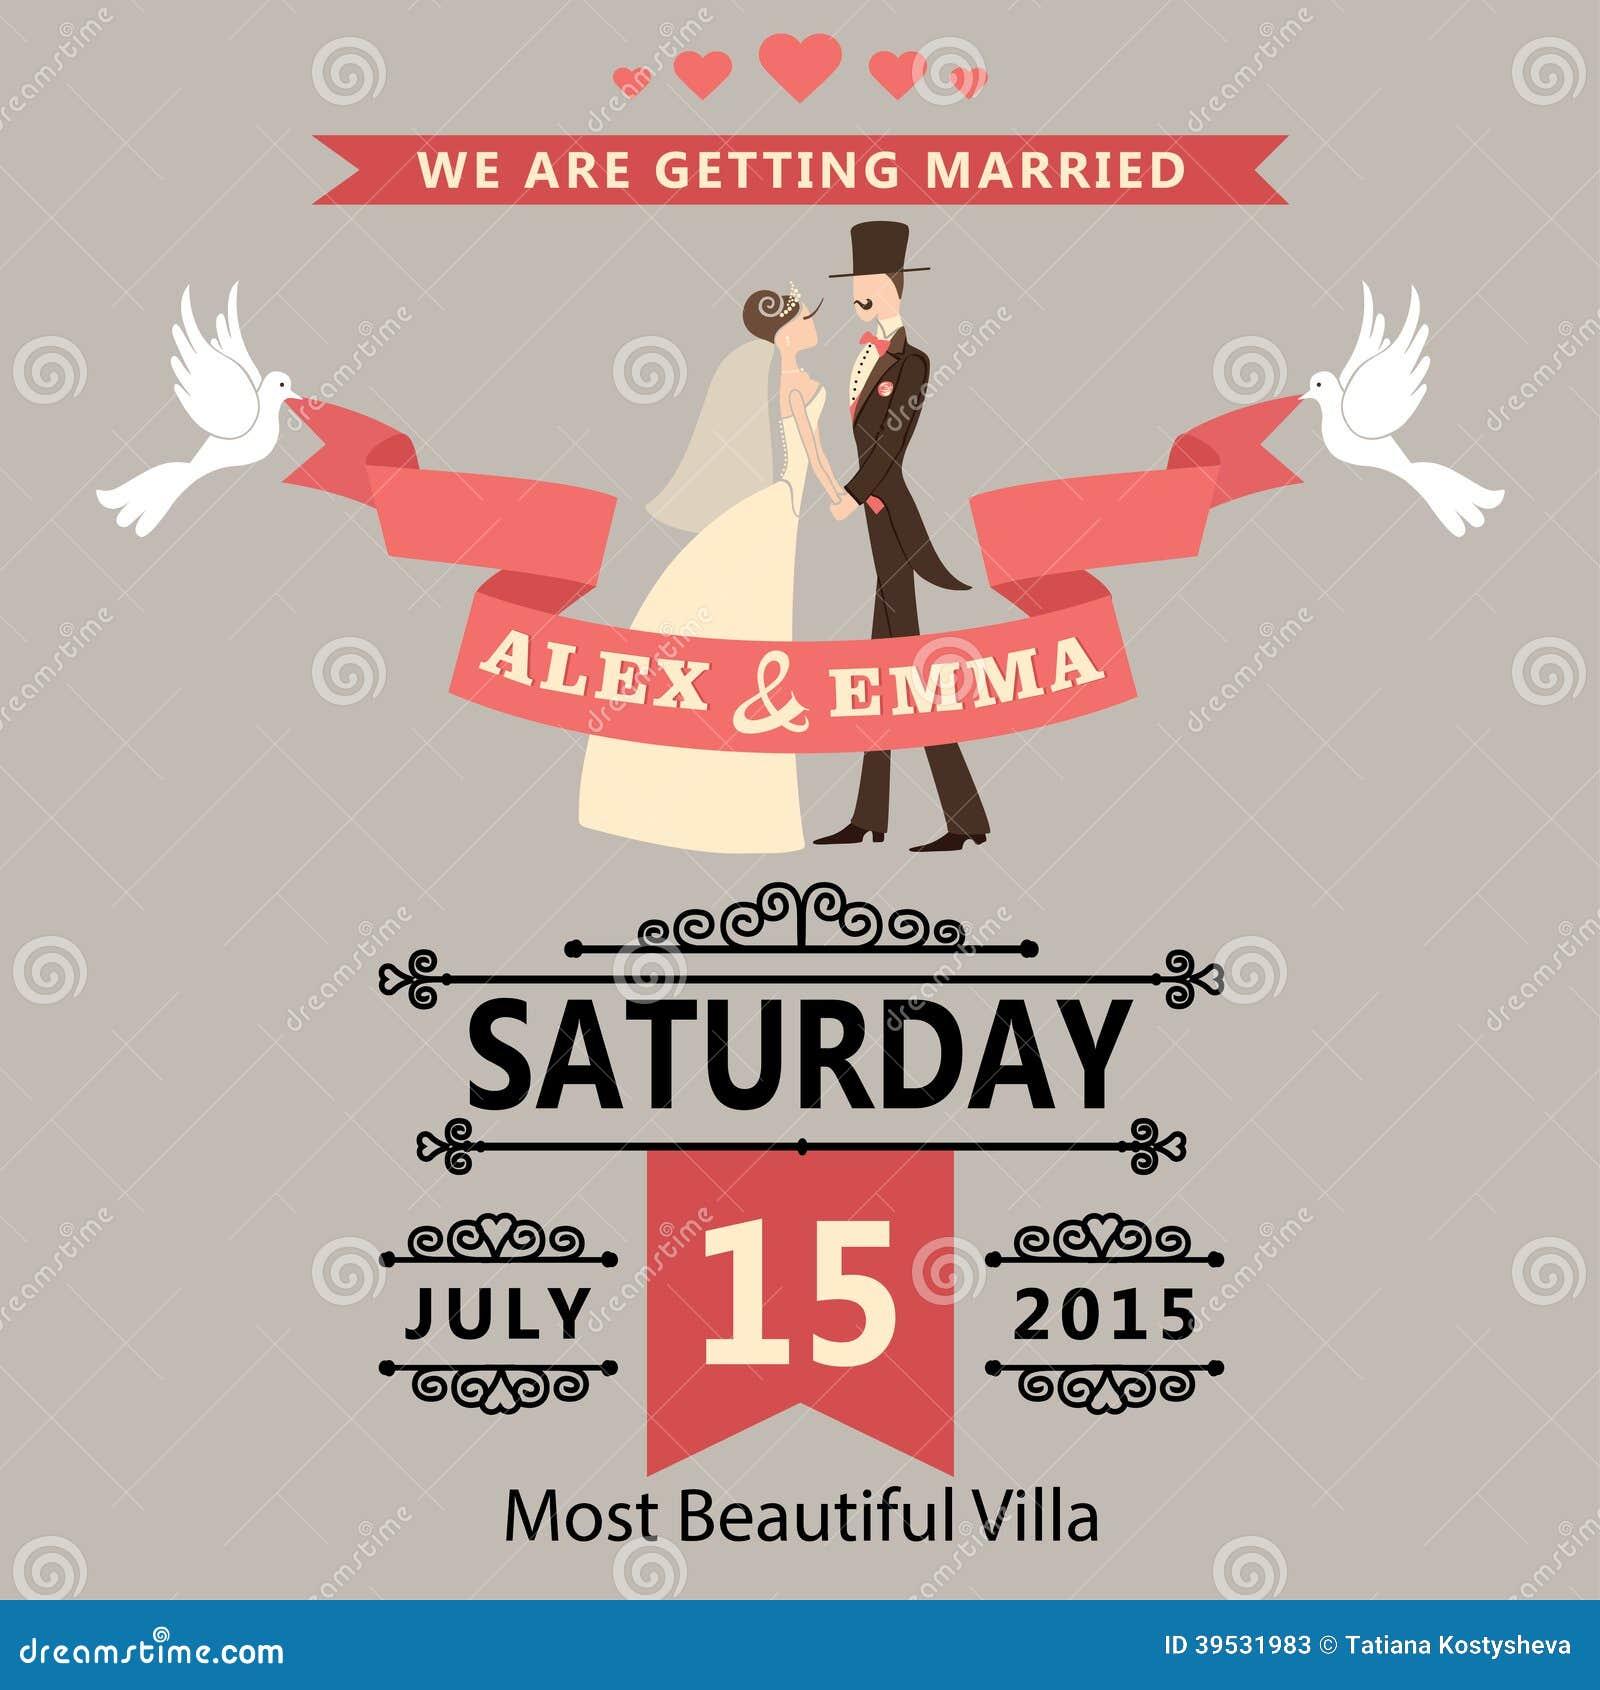 Wedding Invitations Prices as amazing invitations template